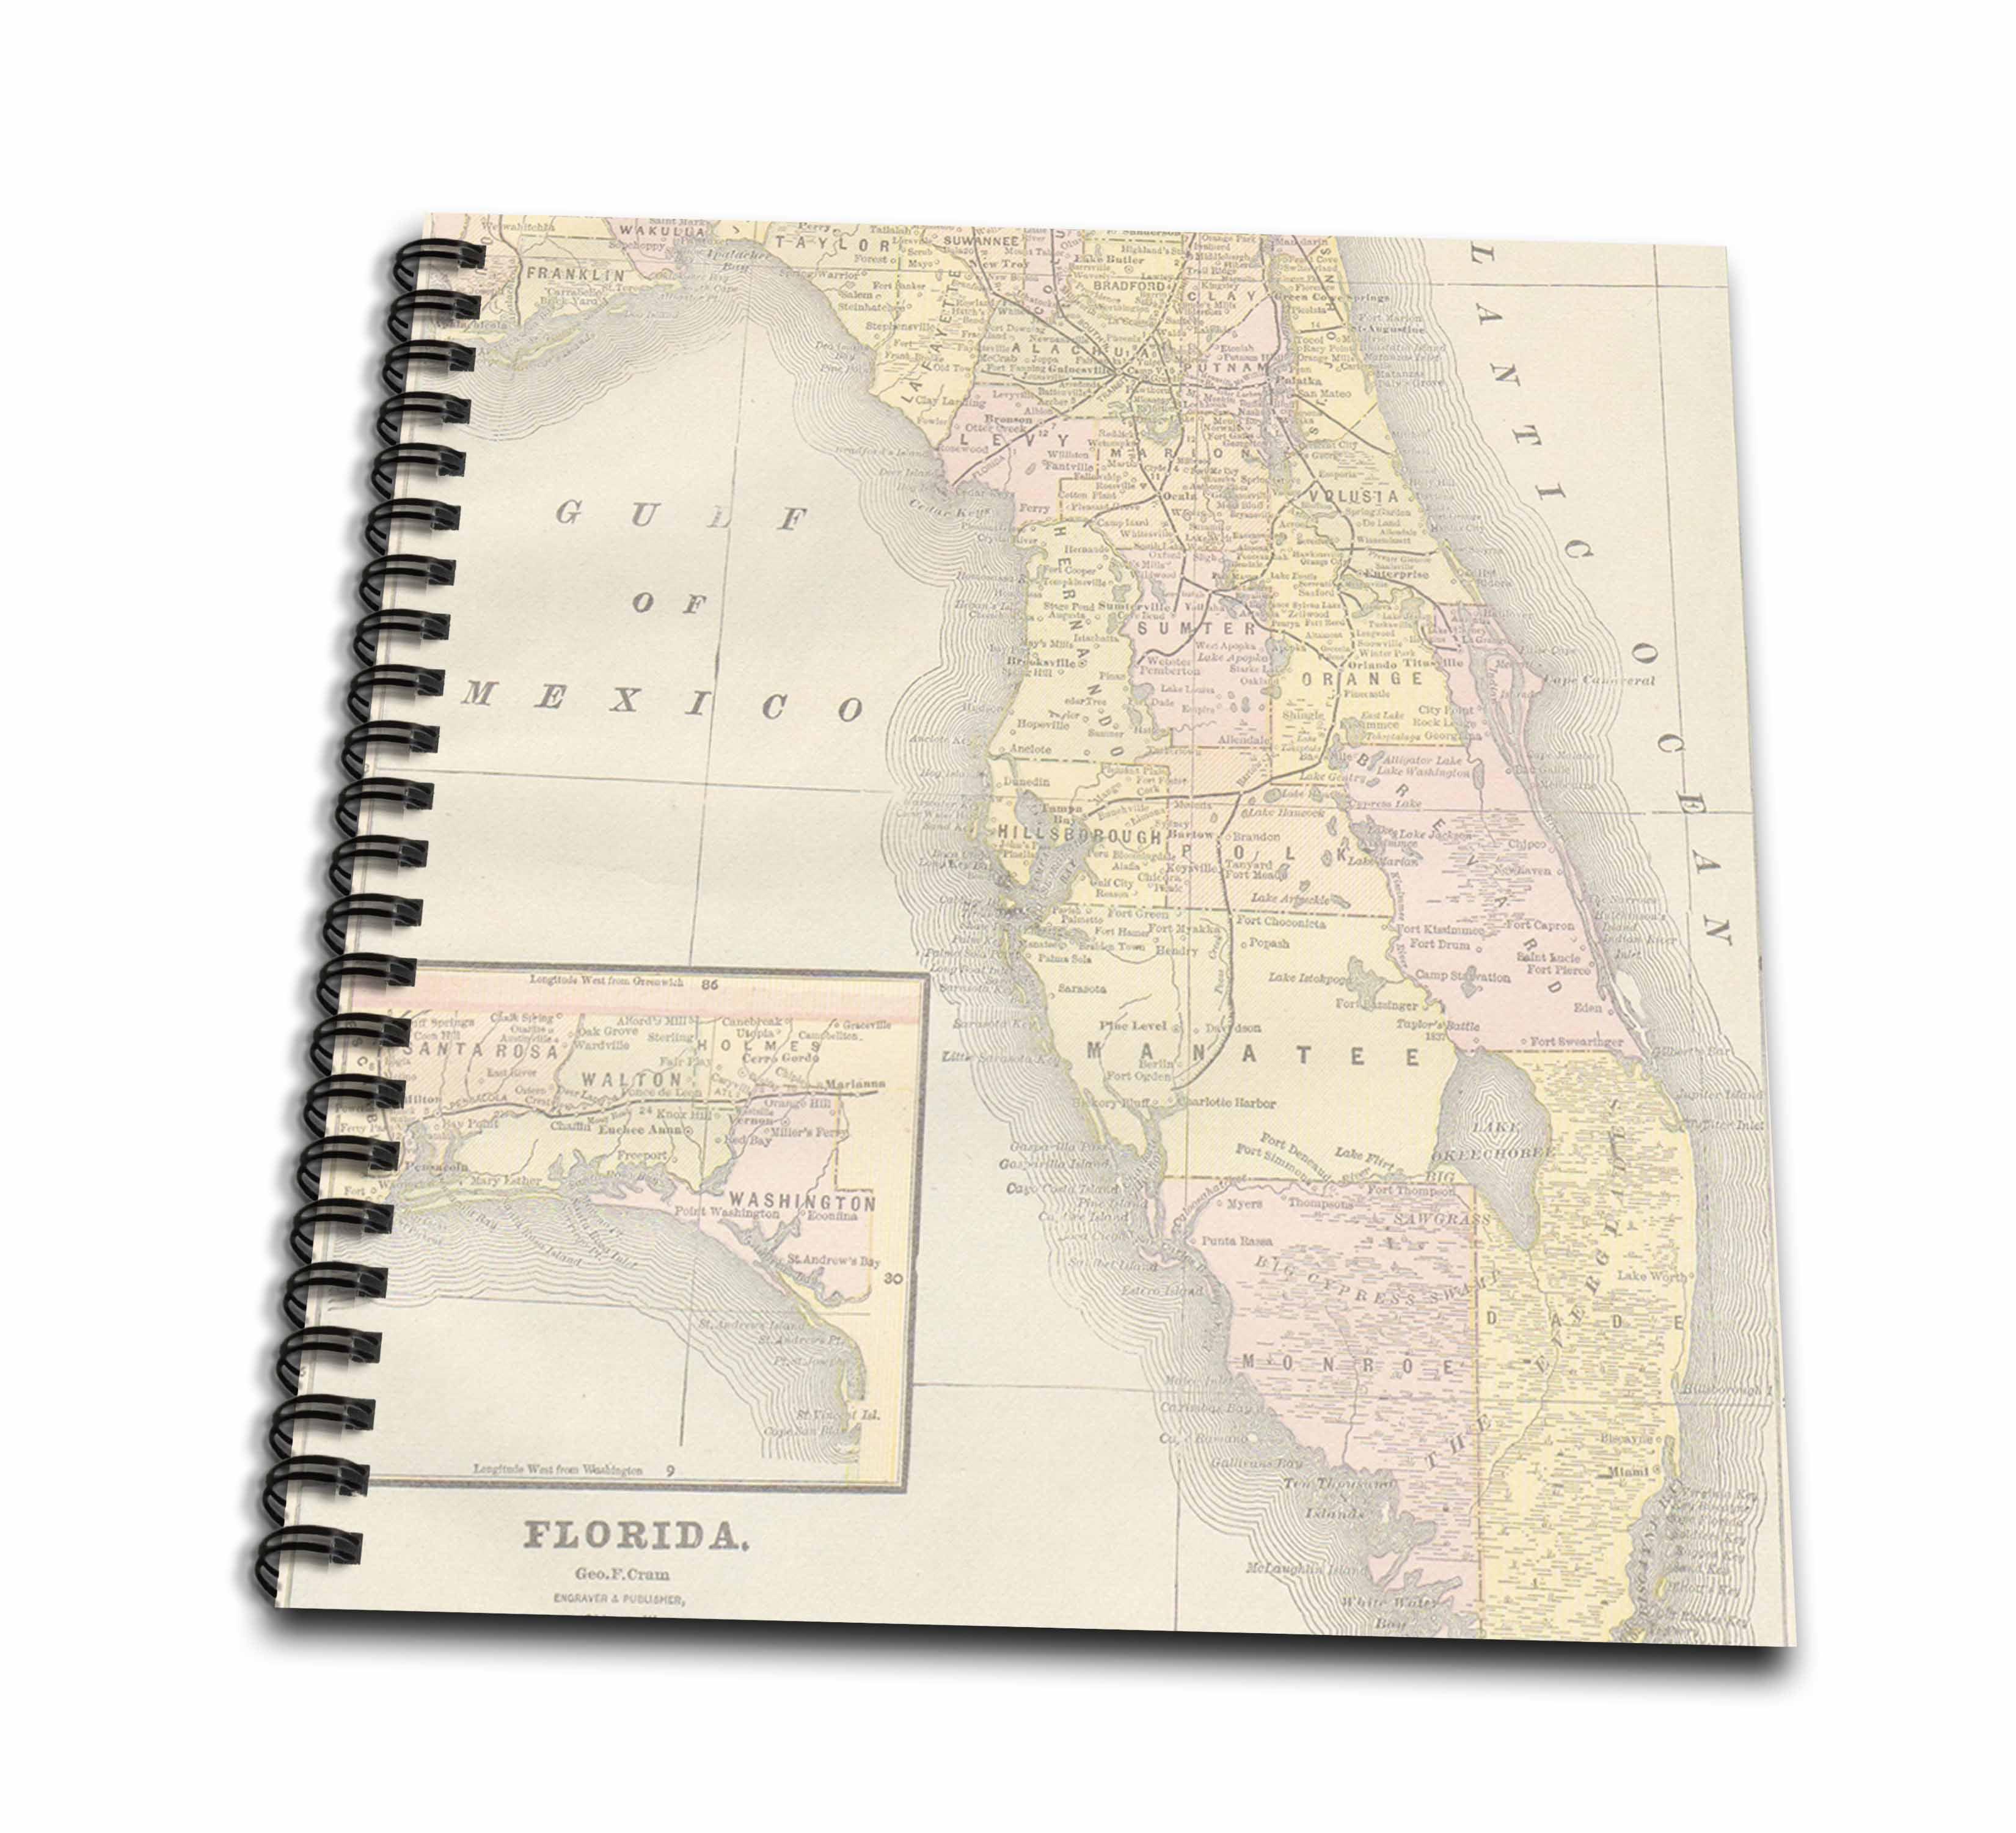 Florida Usa Map.3drose Vintage Florida Usa Map Mini Notepad 4 By 4 Inch Walmart Com